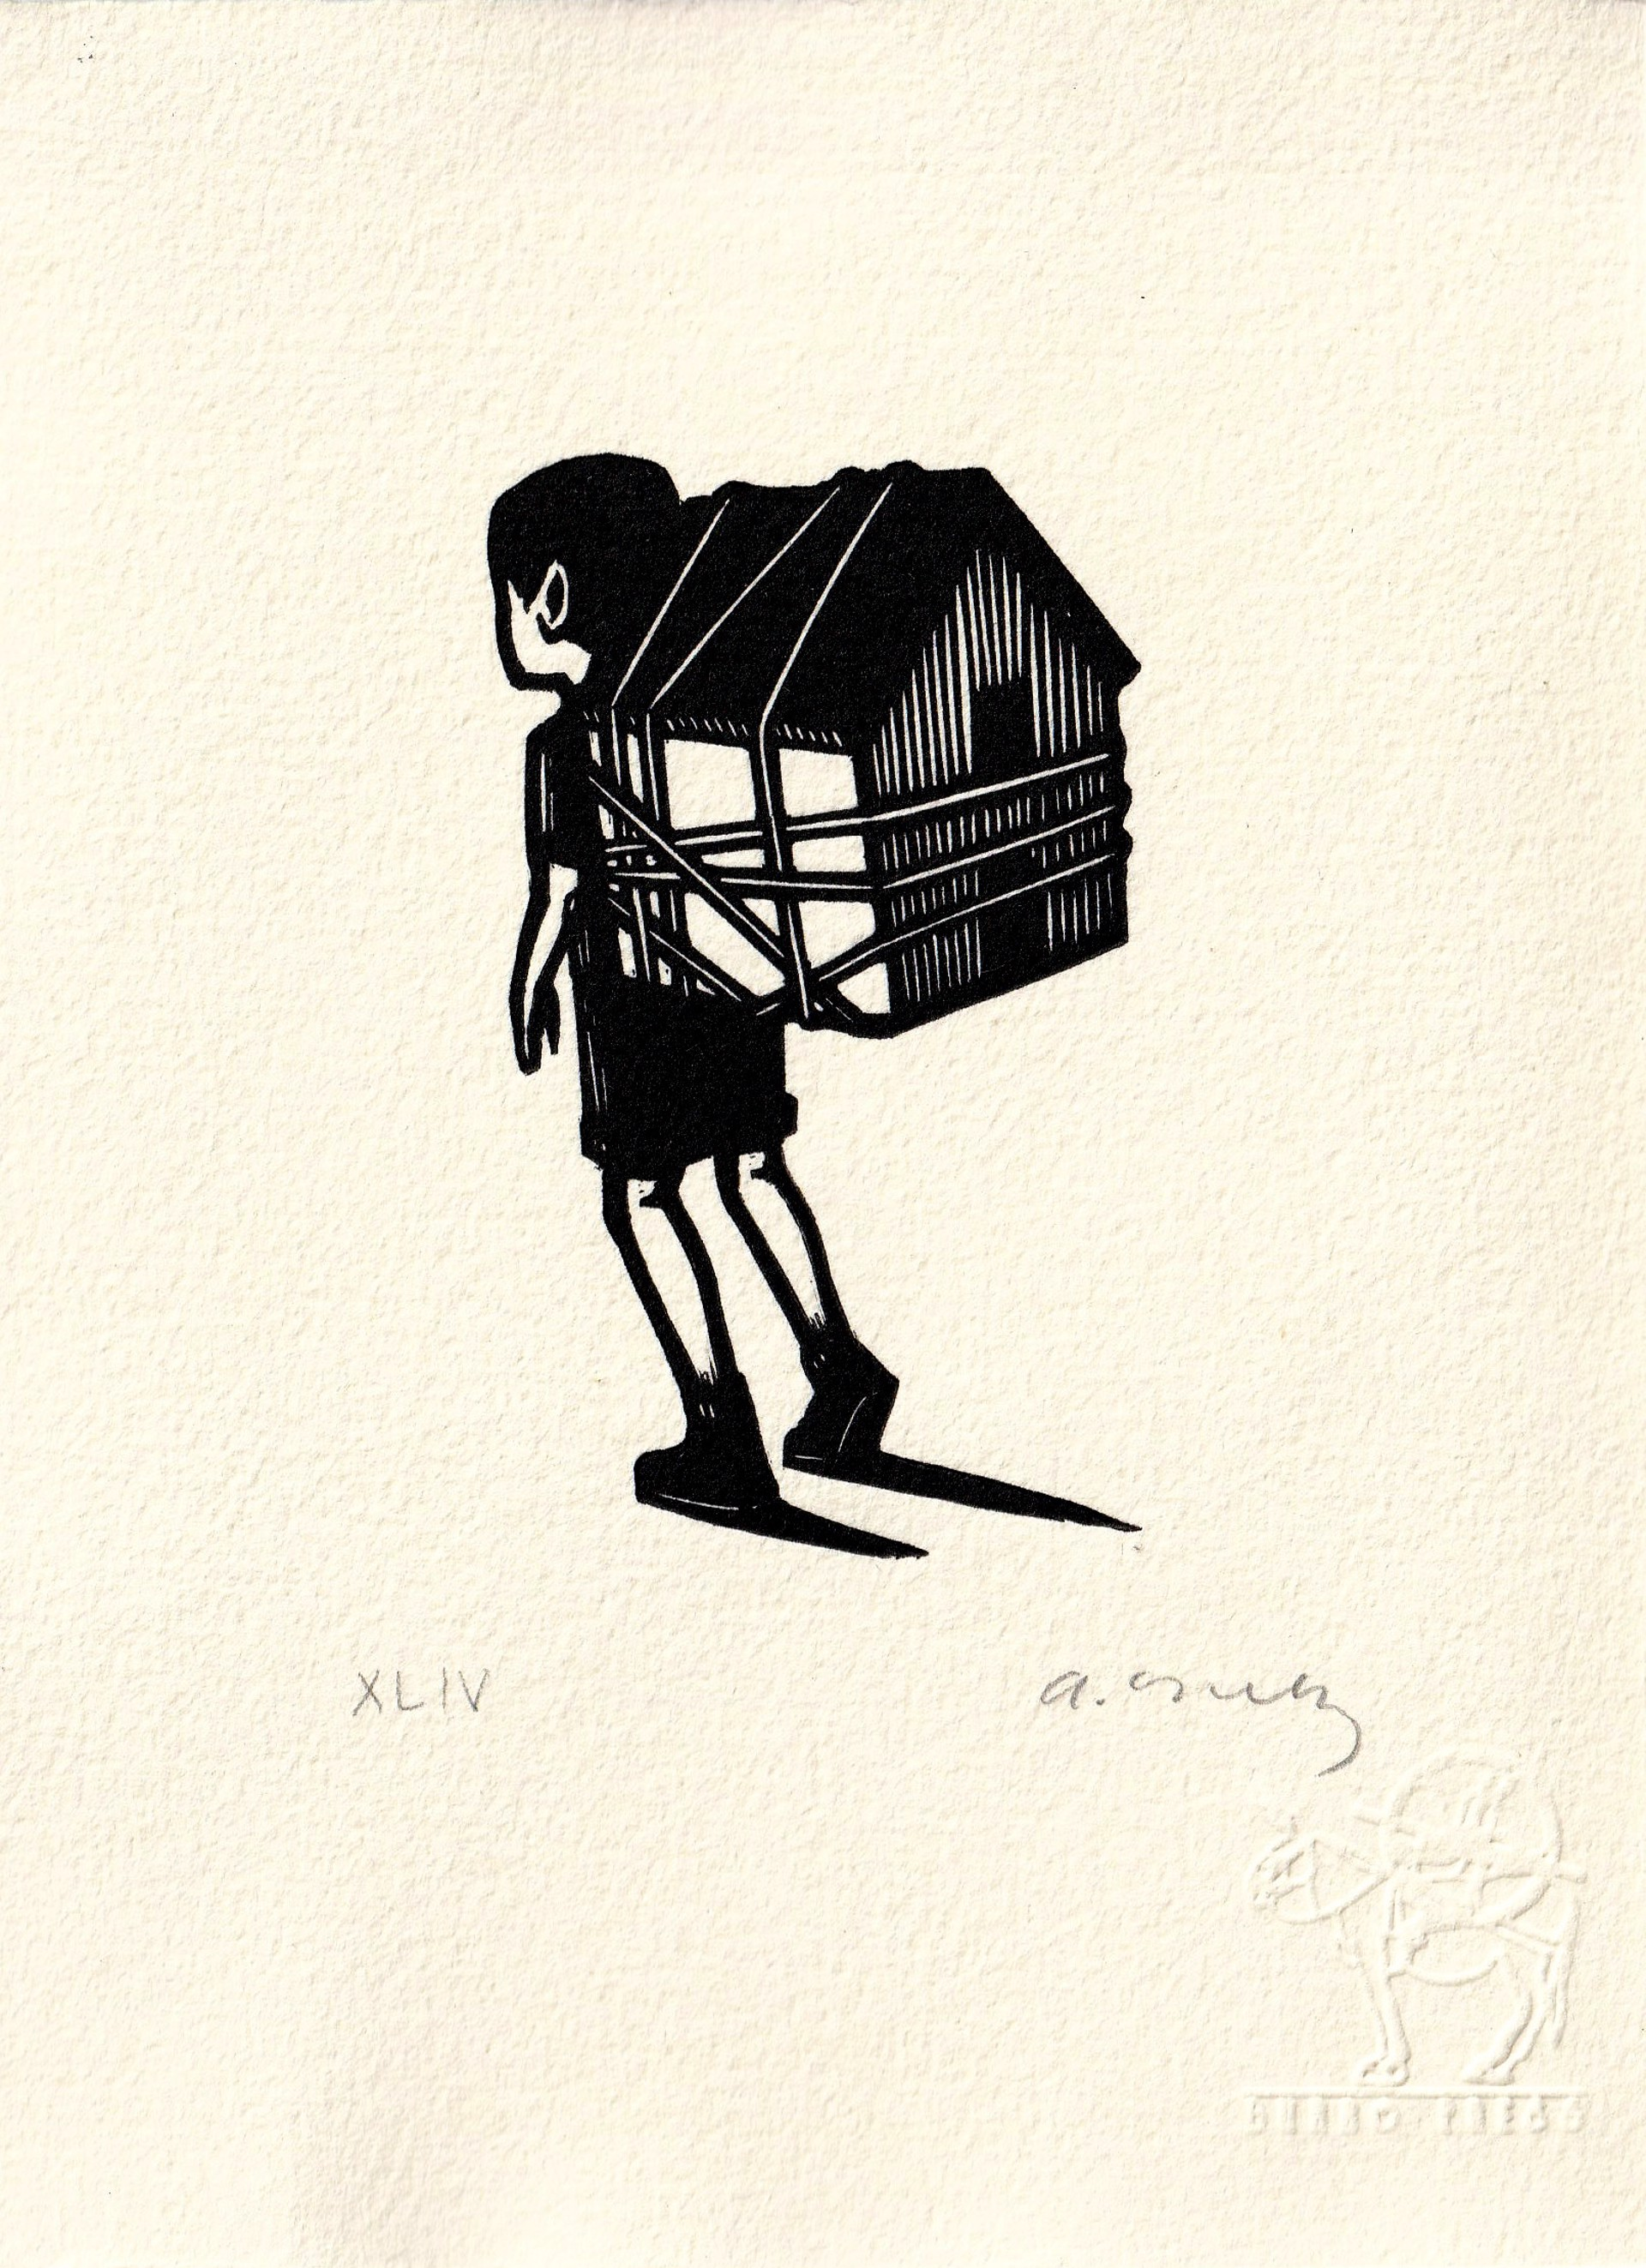 Untitled (Casa) by Alberto Cruz